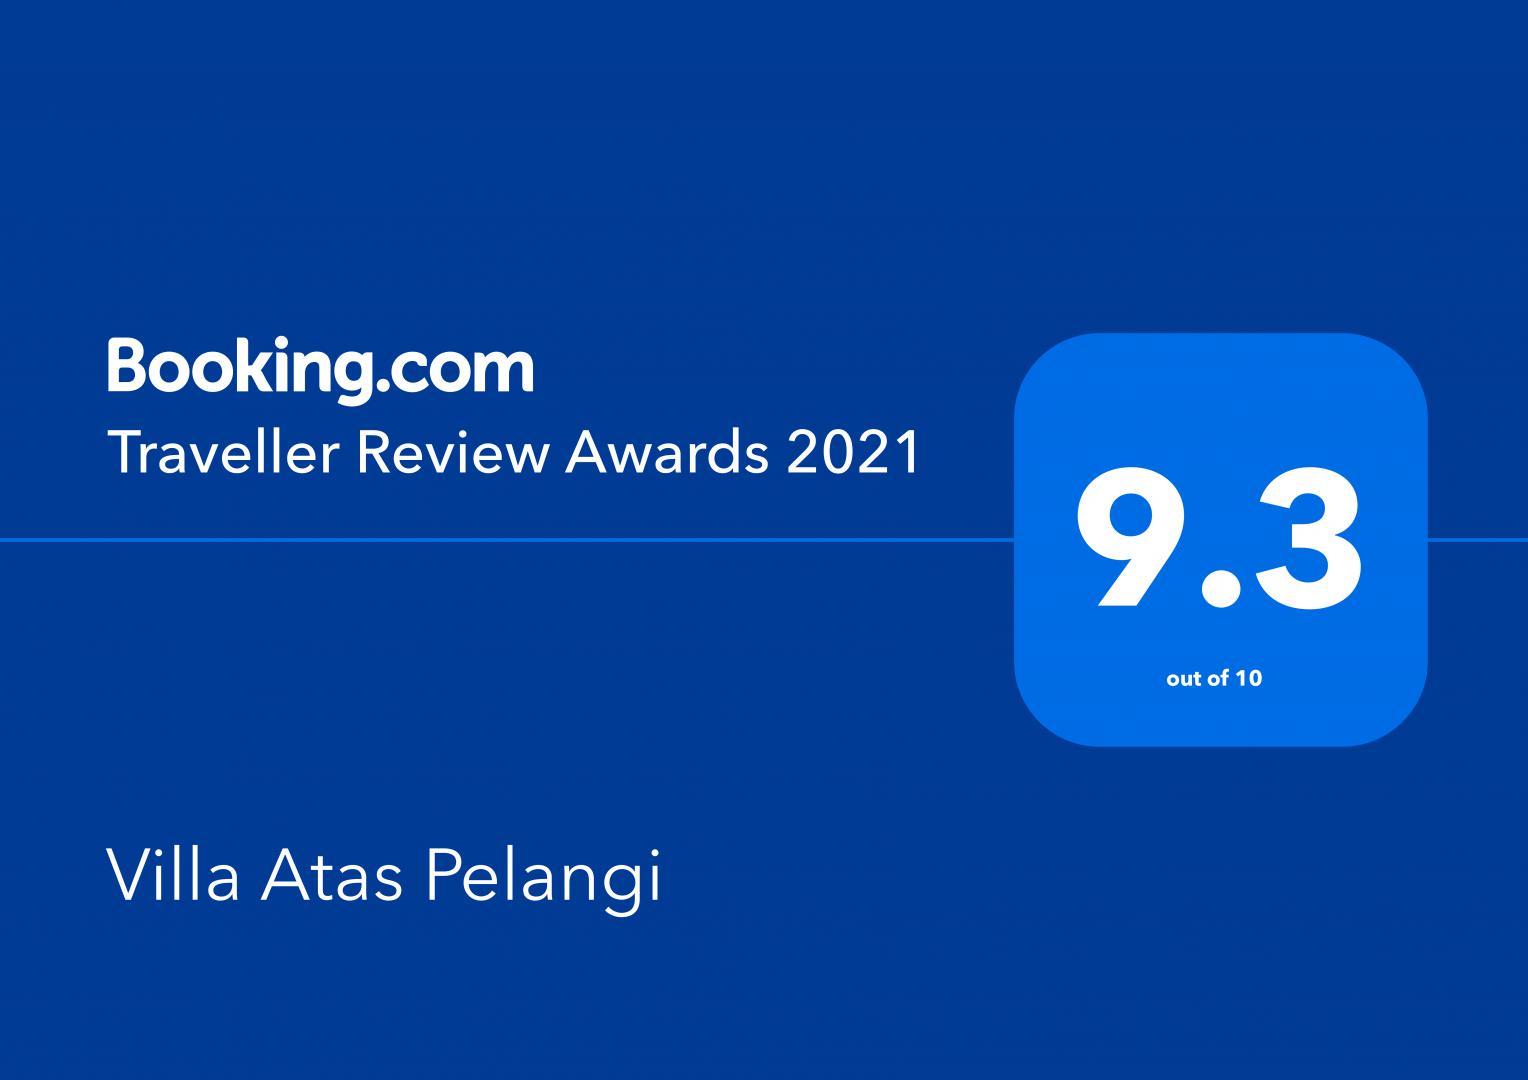 Booking.com Traveller Review Awards 9.3